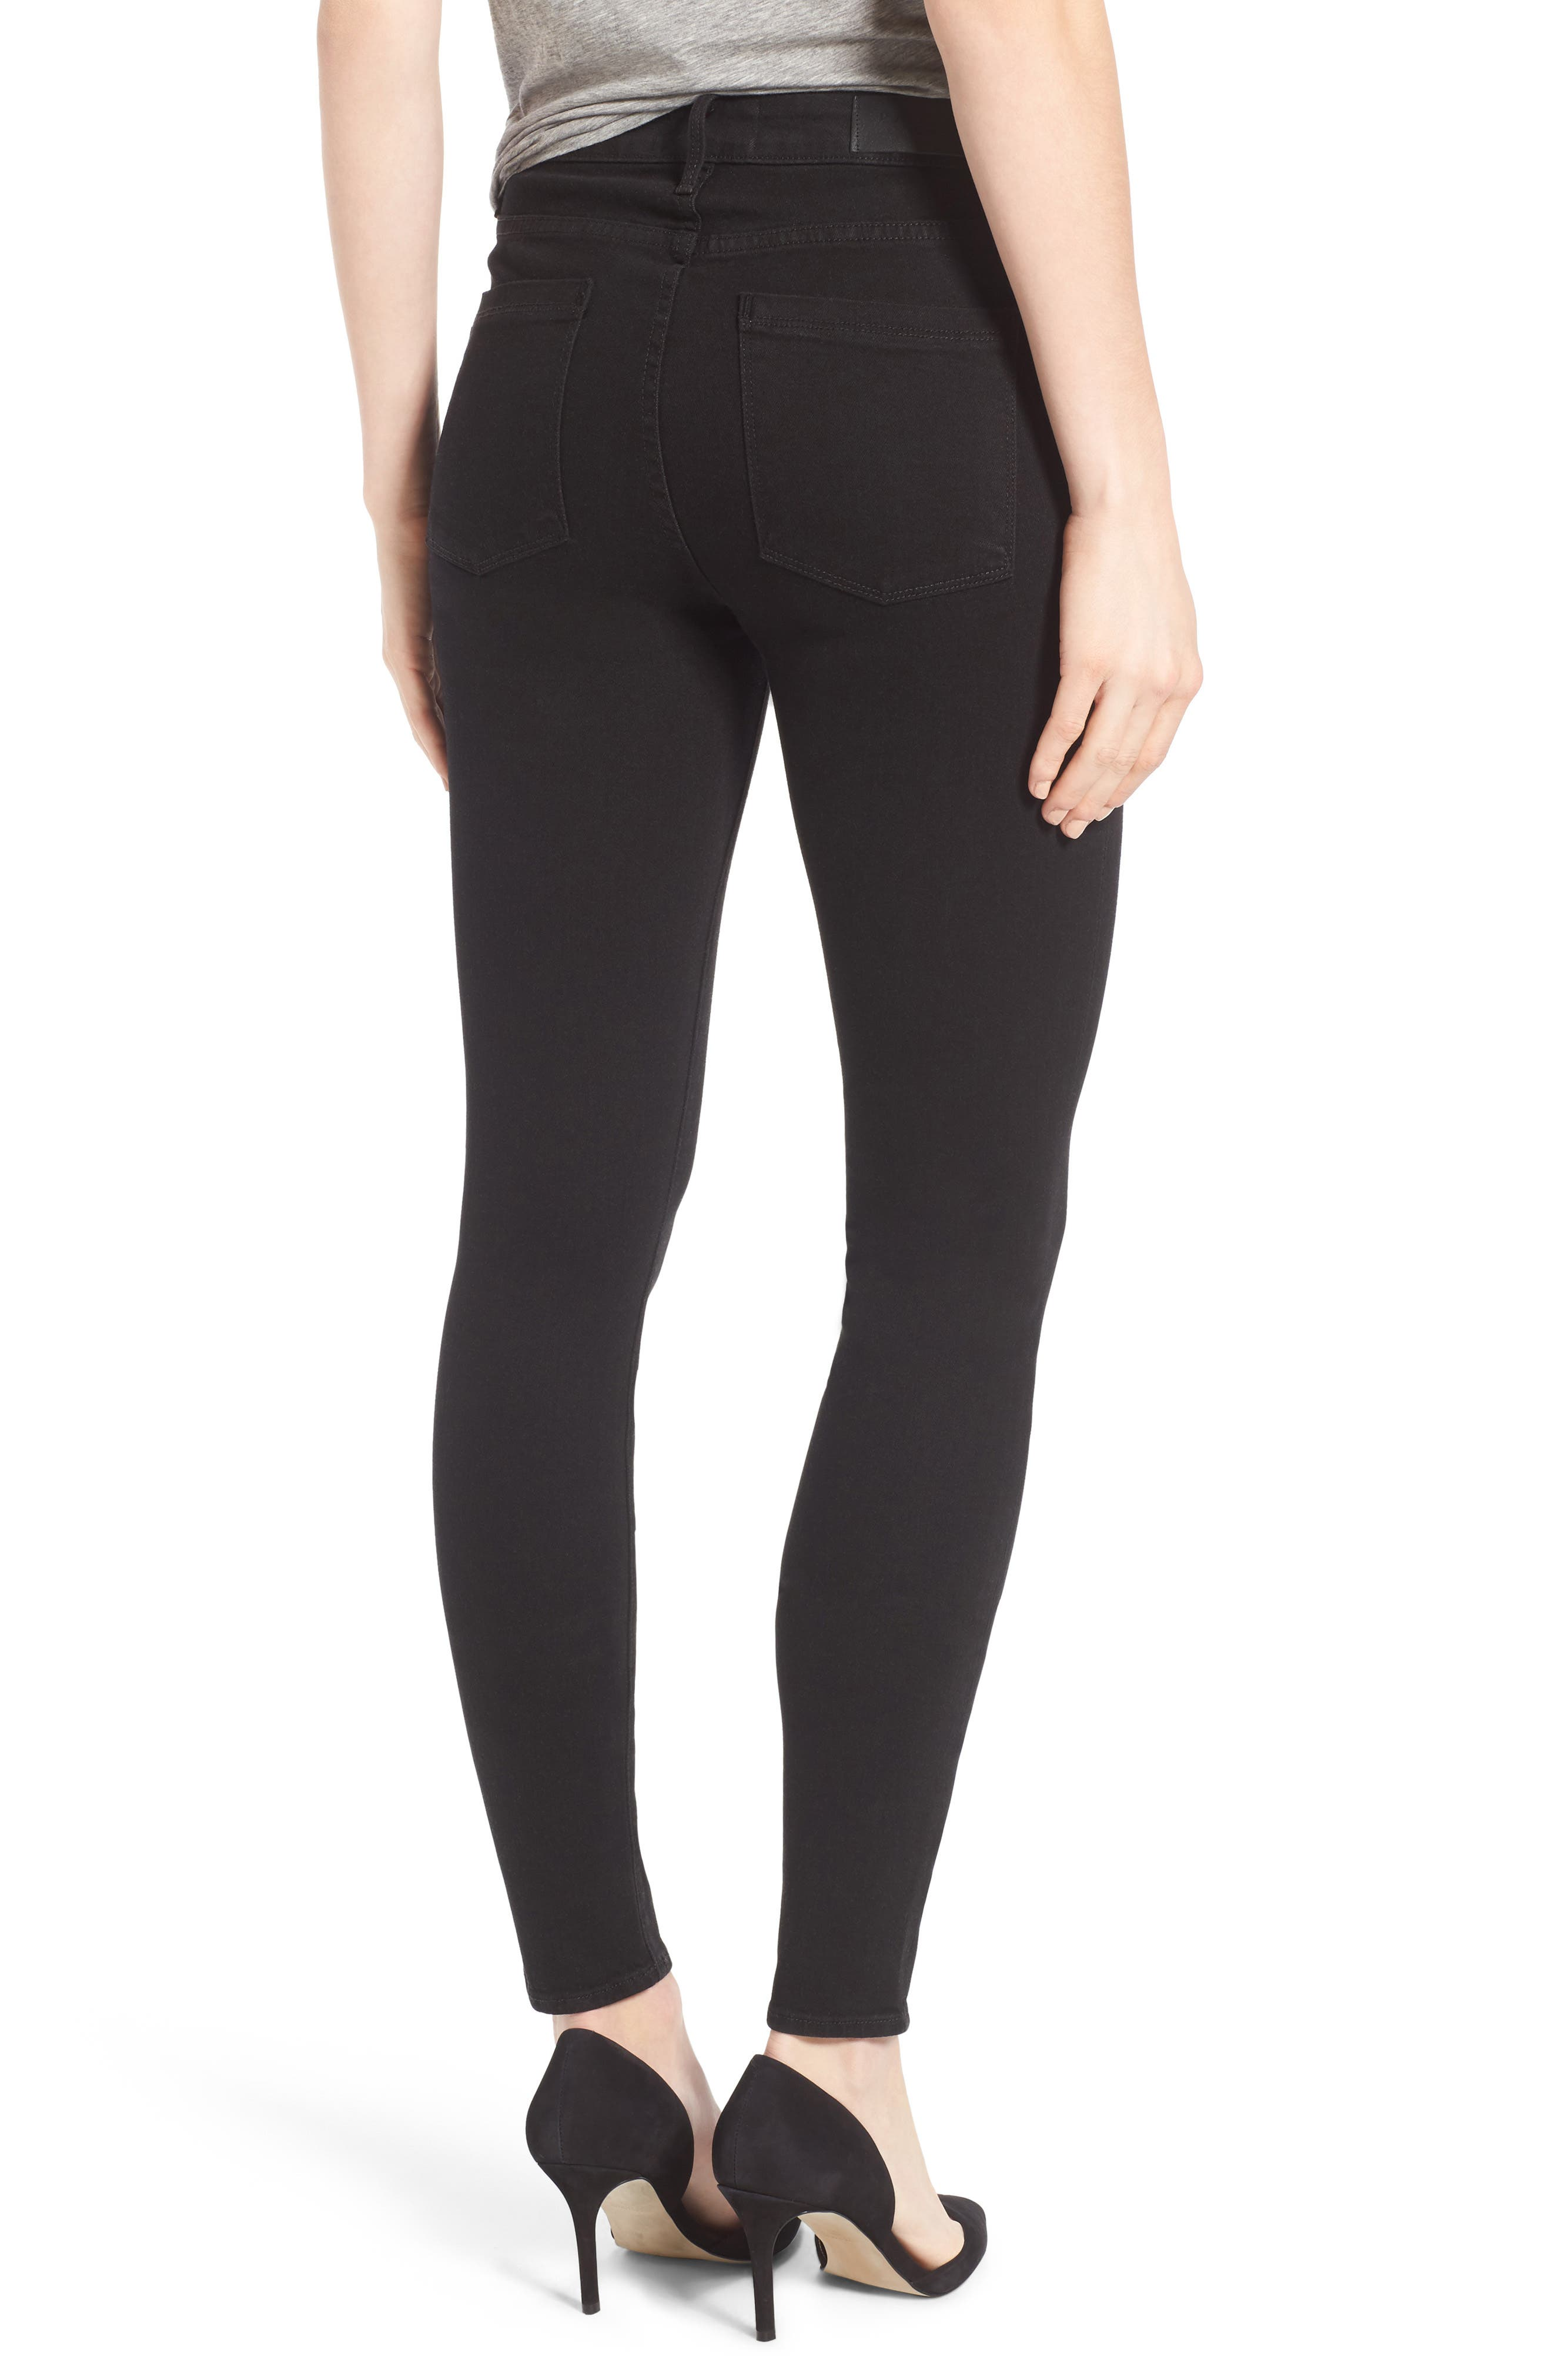 Bombshell High Waist Stretch Skinny Jeans,                             Alternate thumbnail 2, color,                             001